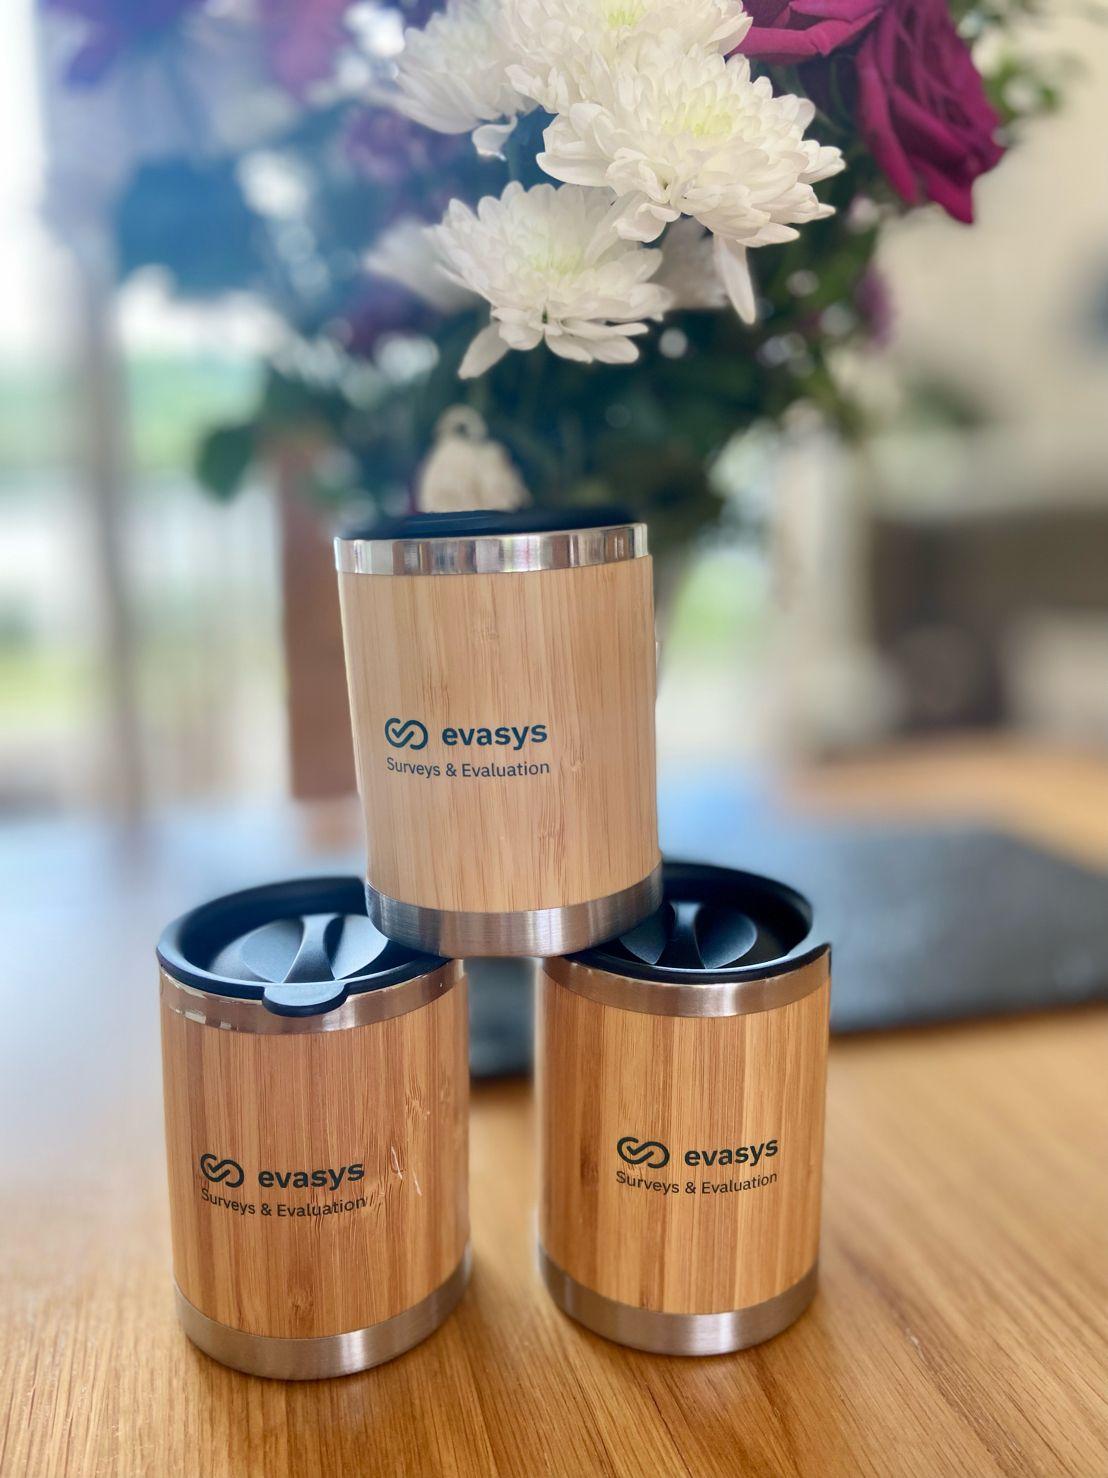 evasys bamboo coffee mugs